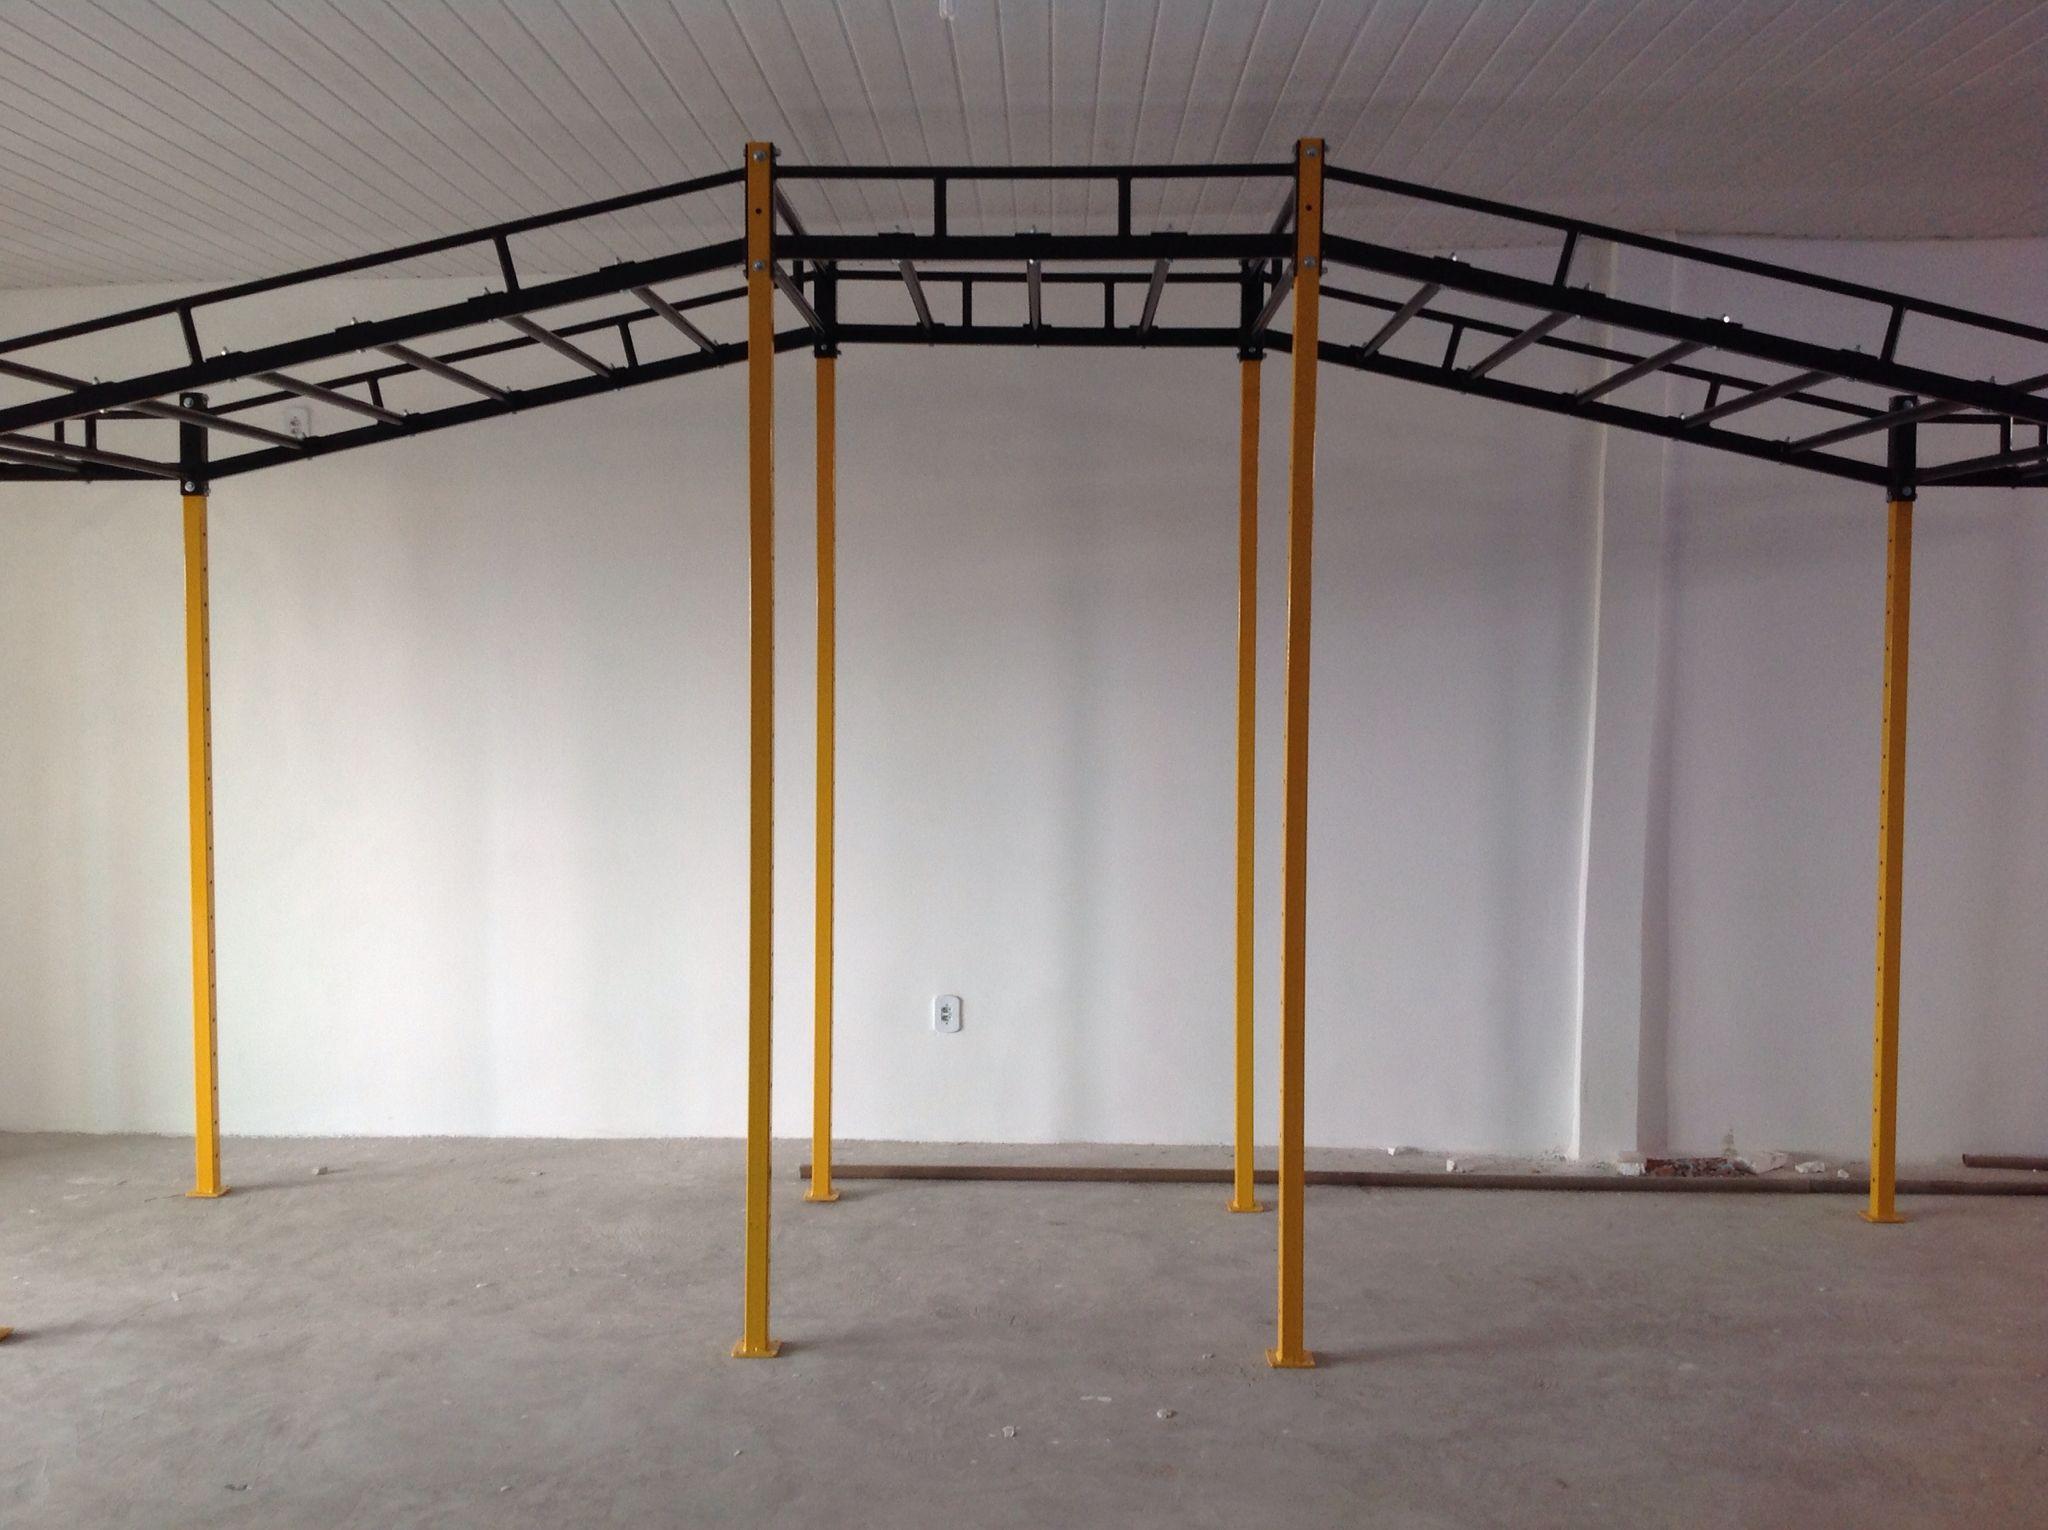 gaiola funcional metalfit fabricamos equipamentos para